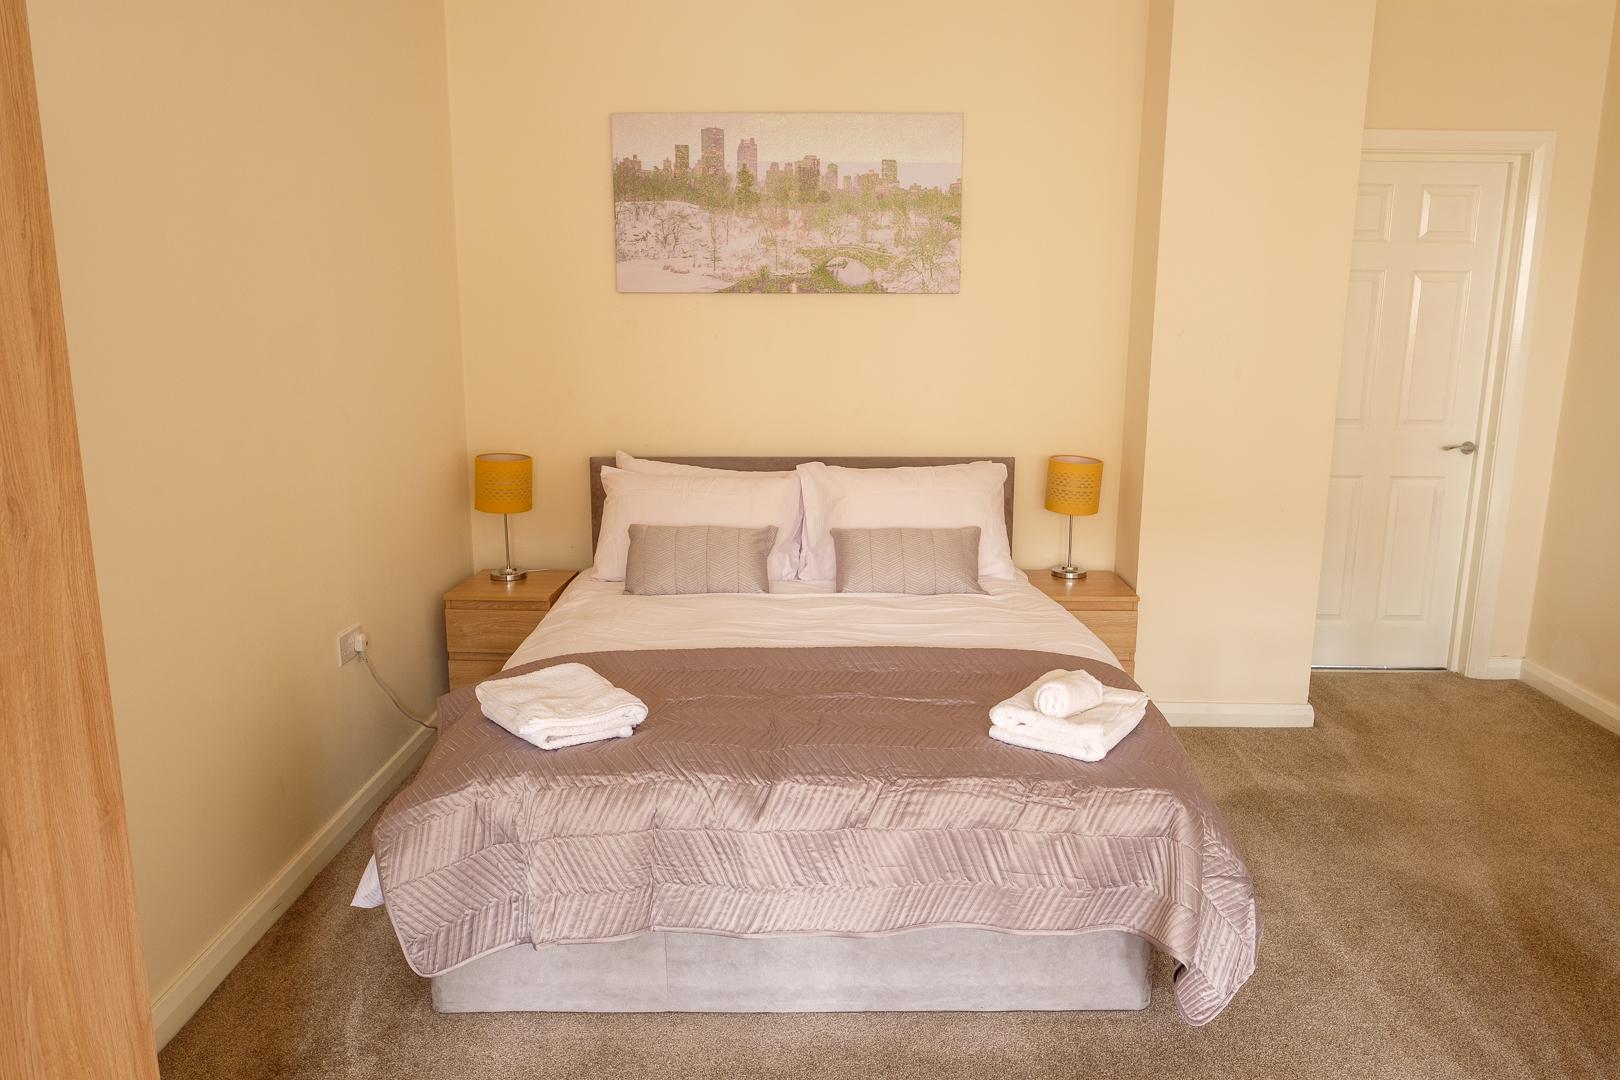 Sleep at Broadwalk Apartment, Centre, Crawley